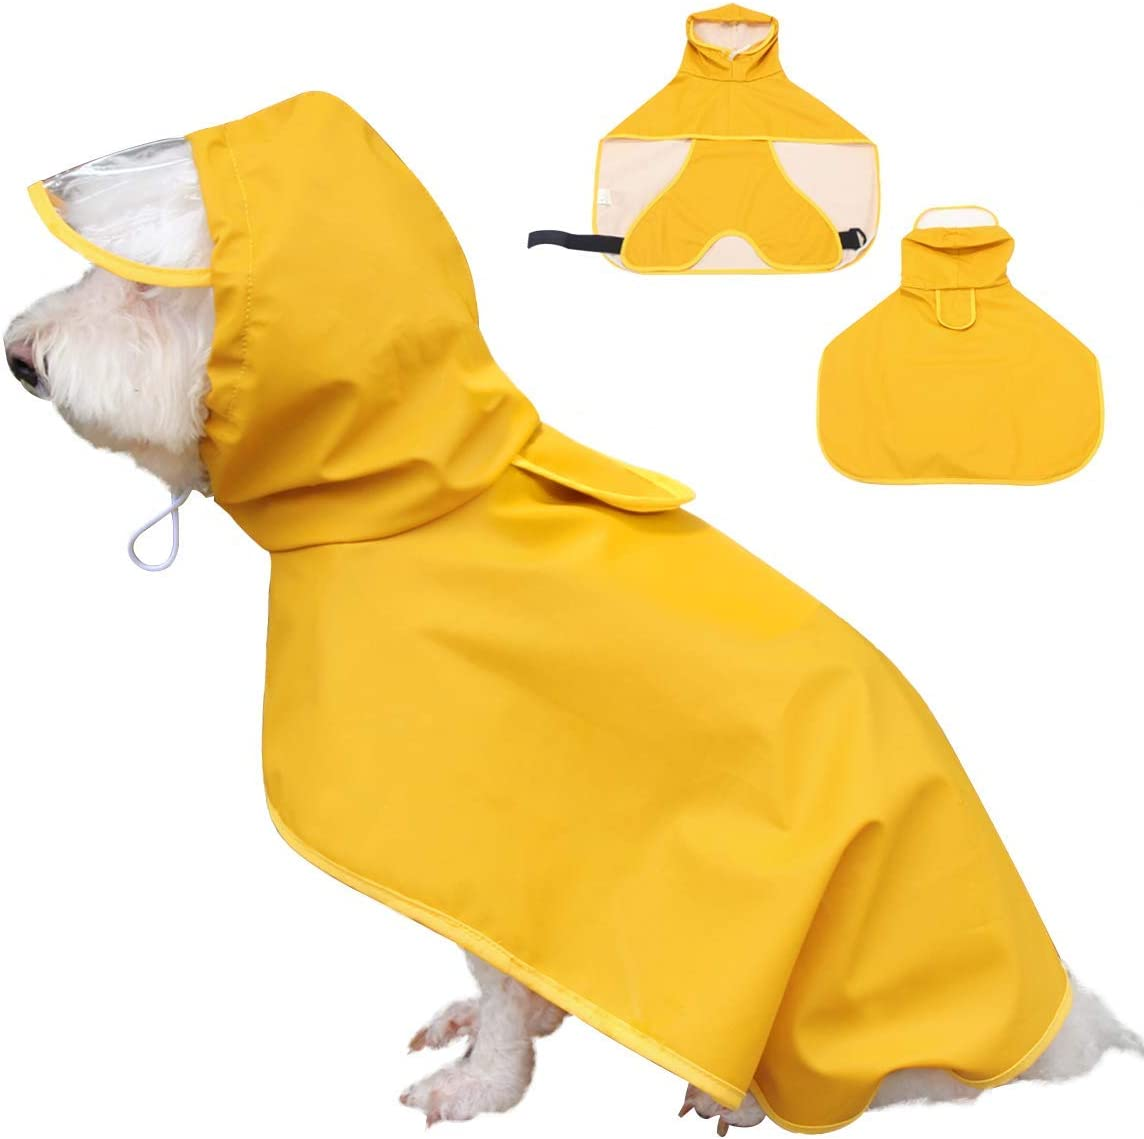 Dociote Impermeable para Perros Mascotas Ajustable Respirante Capa de Lluvia Chubasquero con Capucha & Collar Agujero para Perro pequeño Mediano PU Amarillo